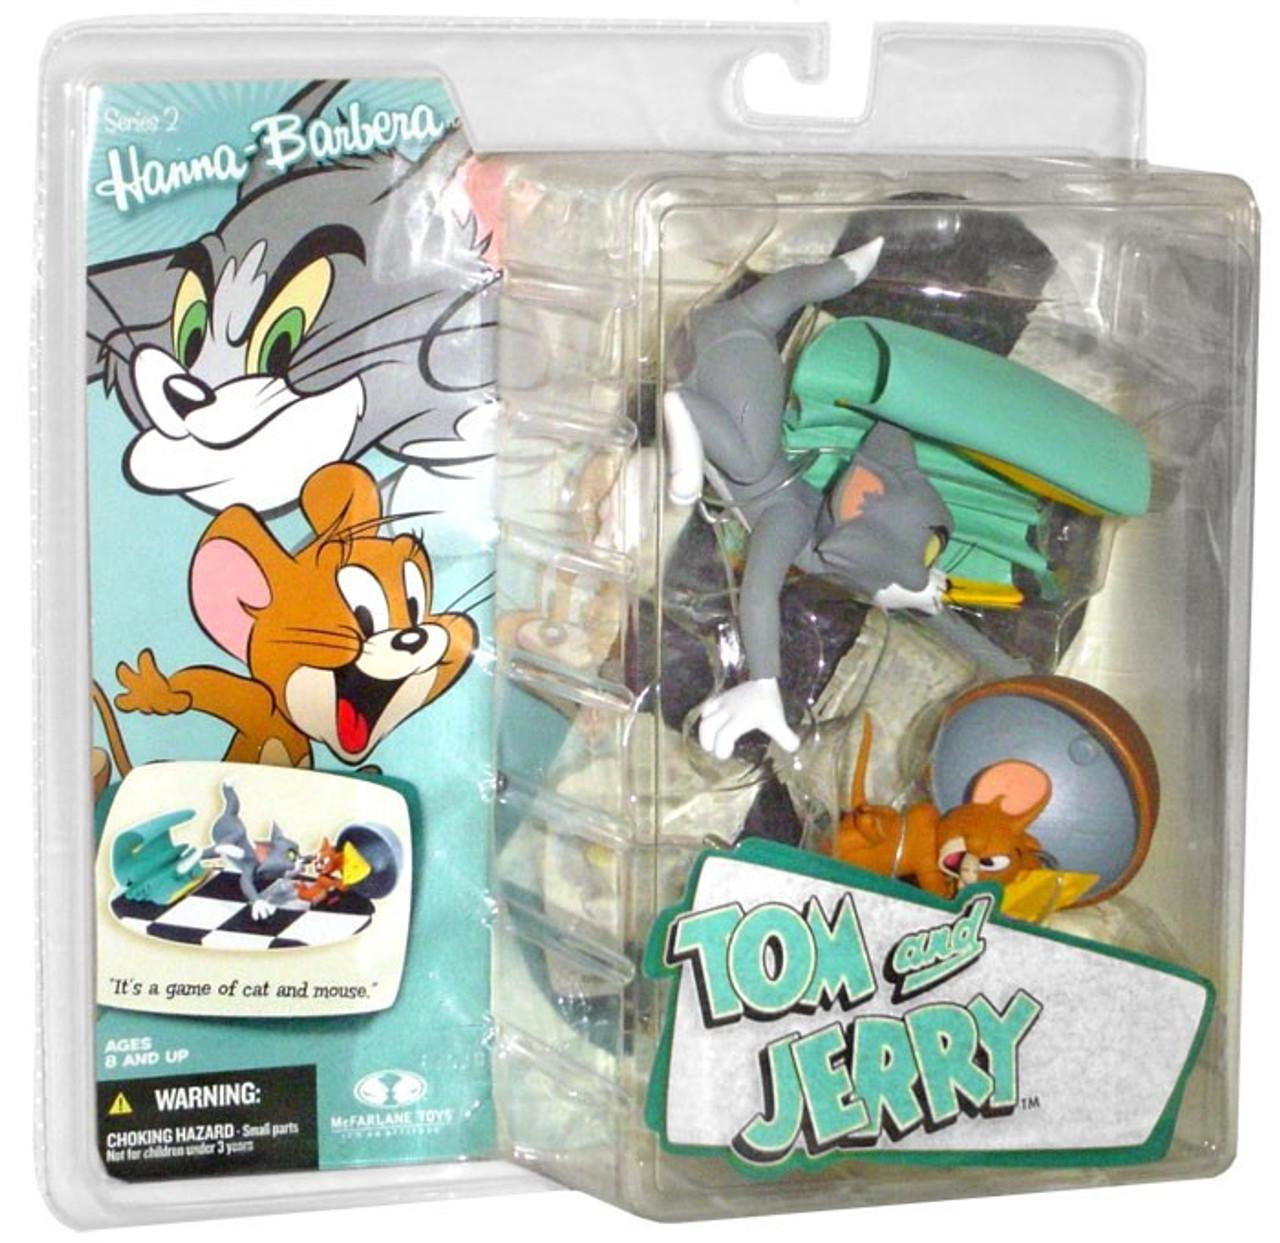 McFarlane Toys Hanna-Barbera Series 2 Tom Jerry Action